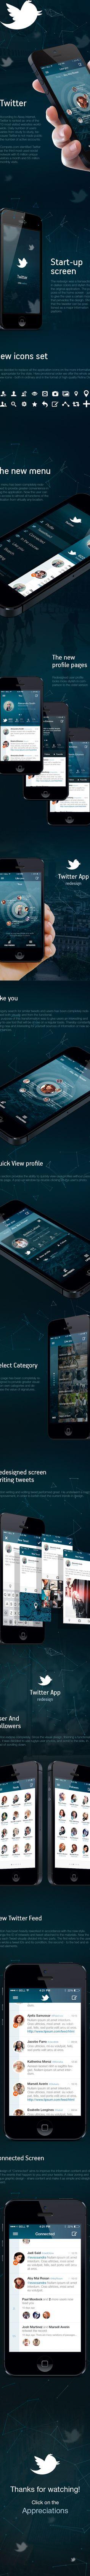 Twitter. Redesign Concept by Maxim Eriomov, via Behance